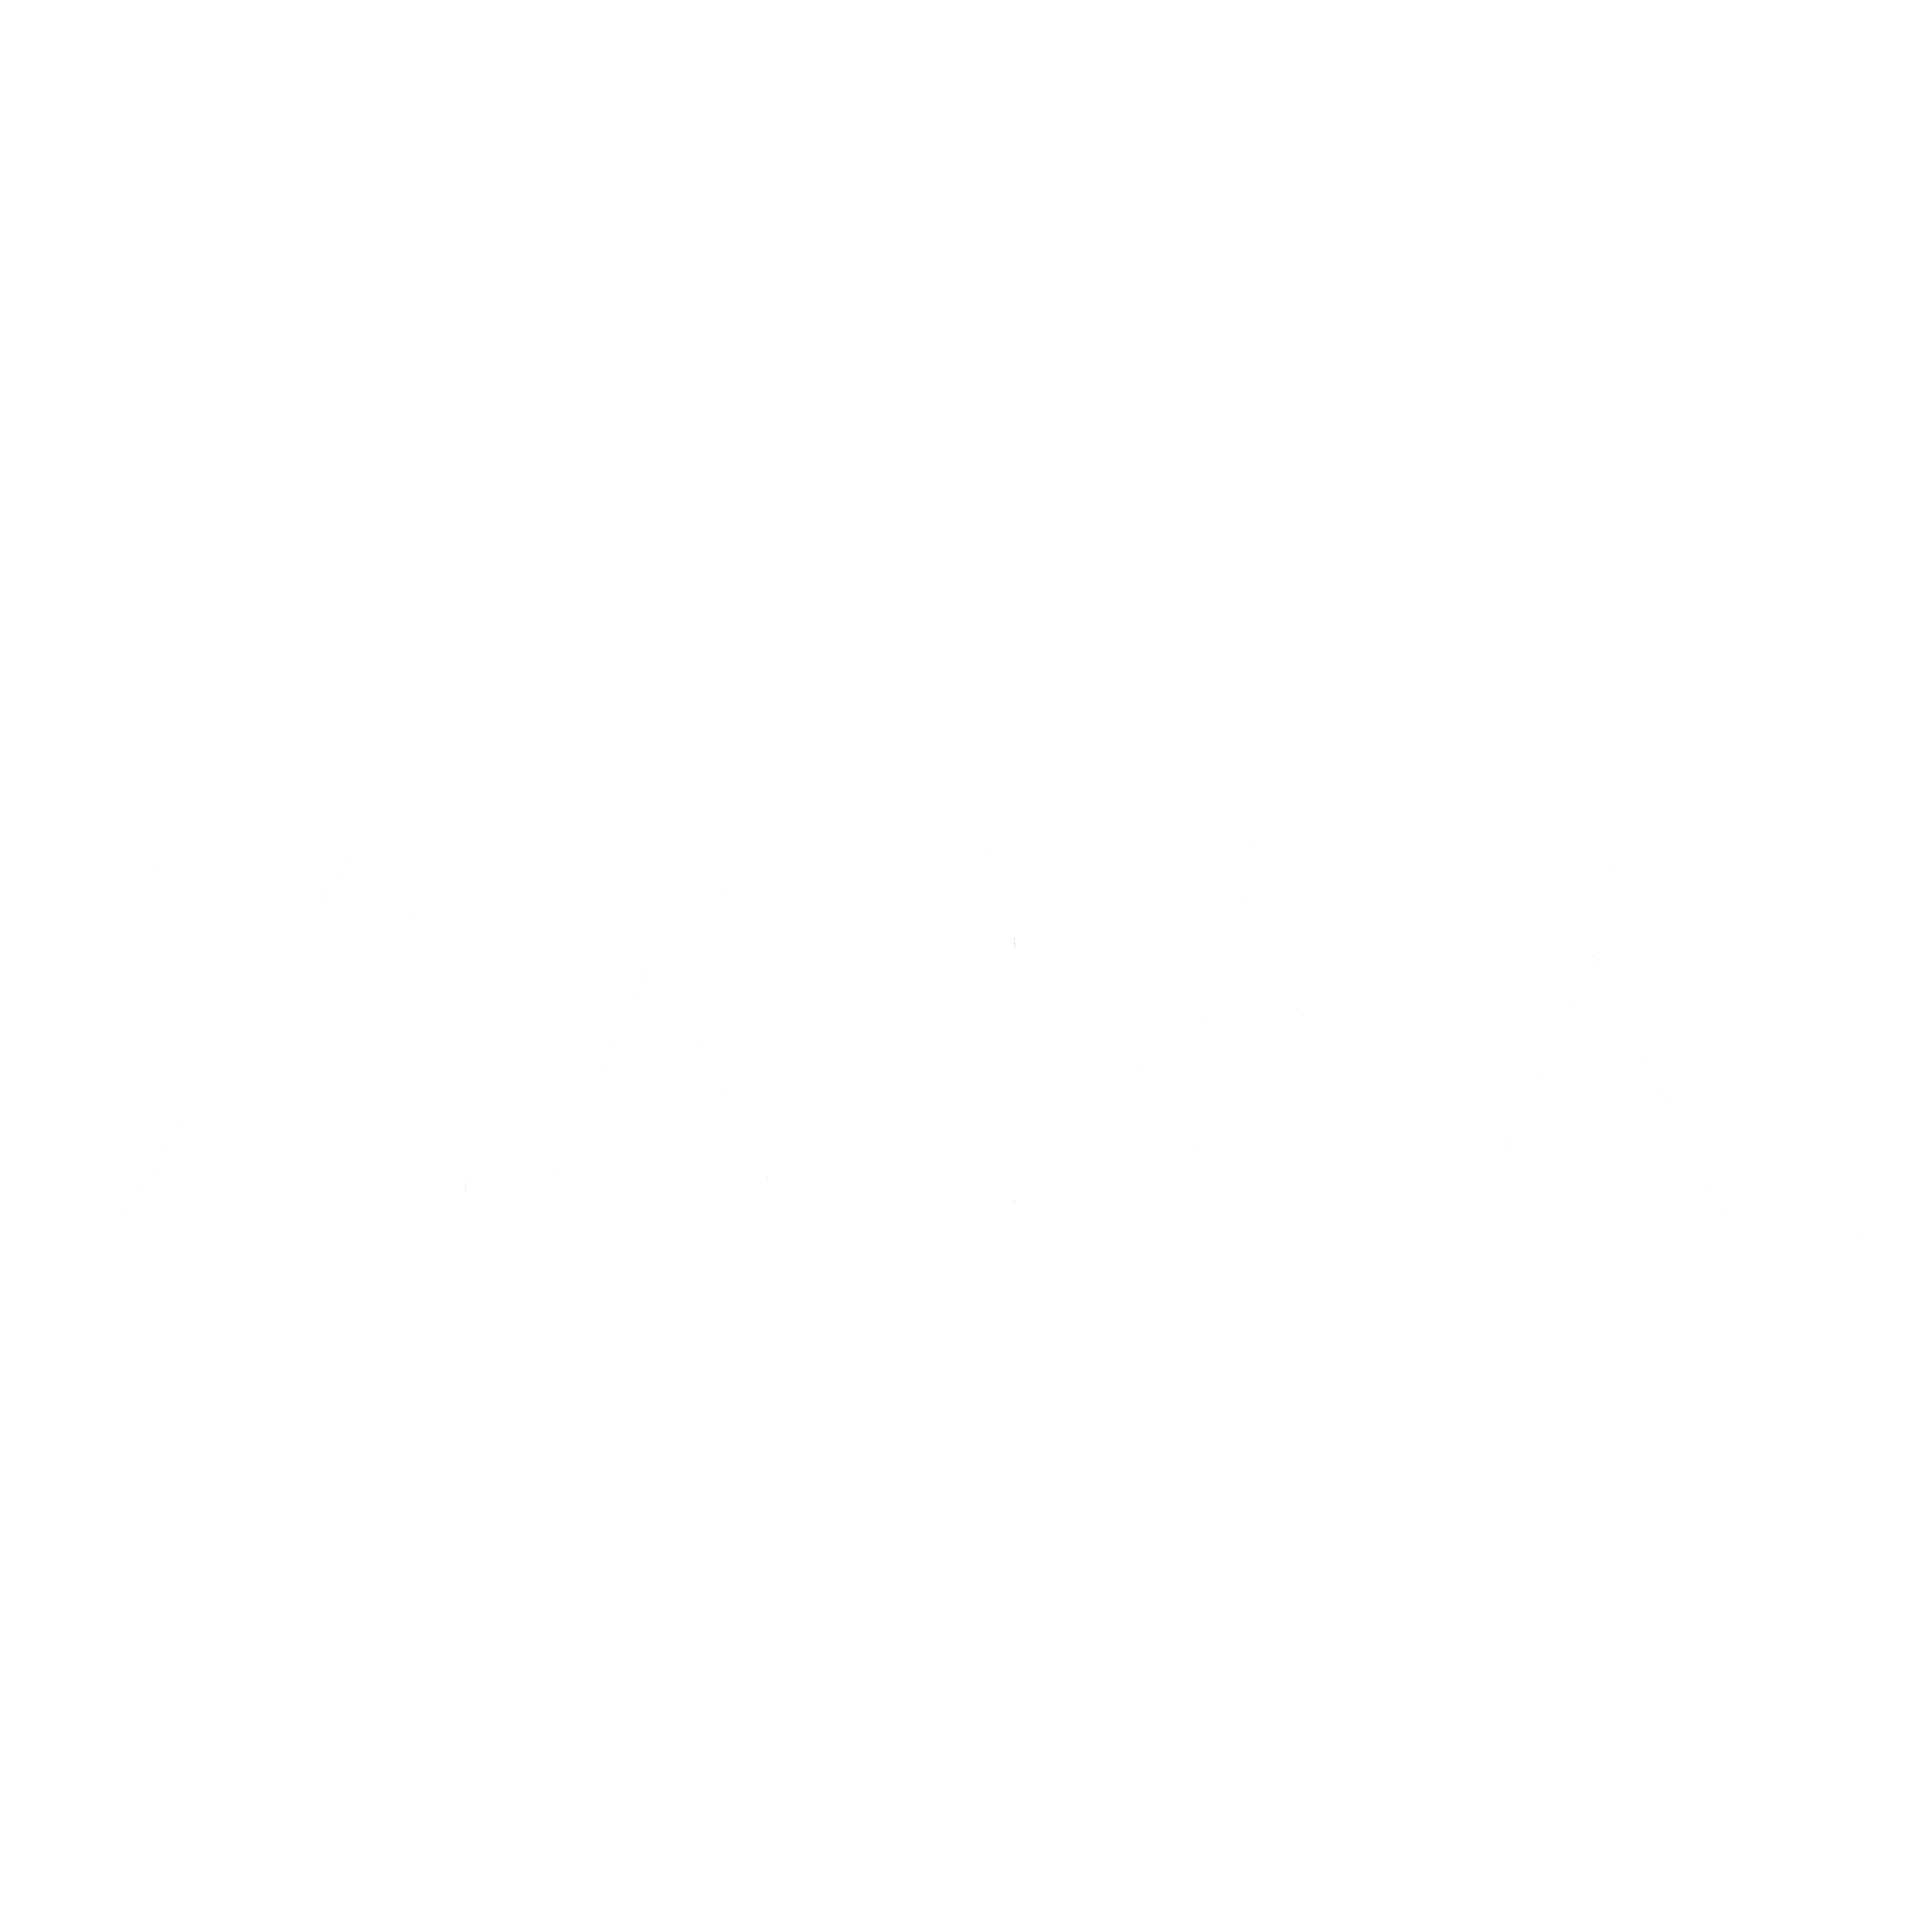 zara-2-logo-black-and-white